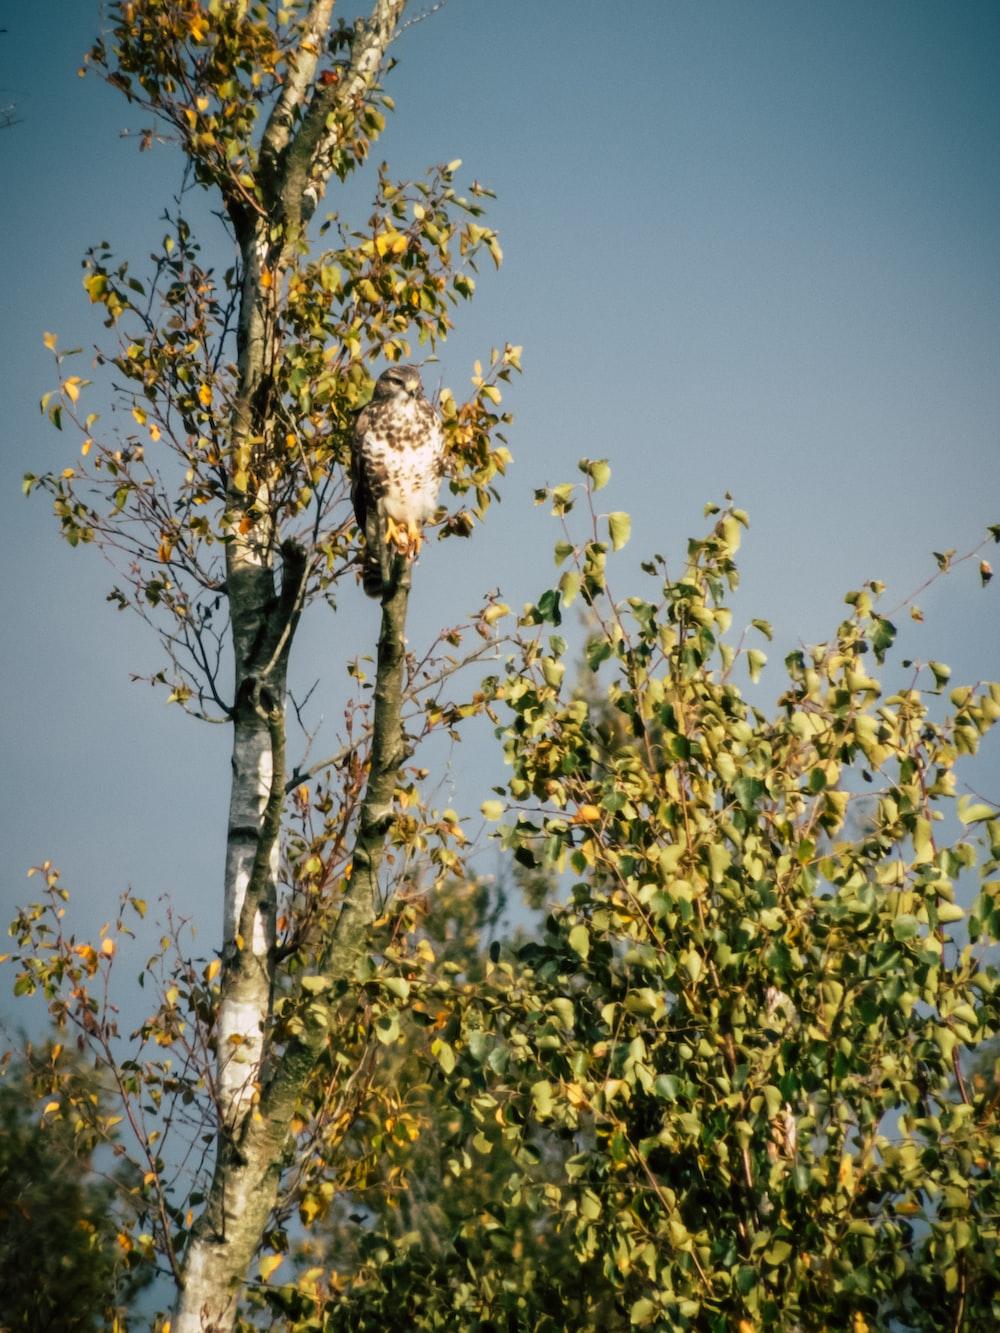 brown small beaked bird on tree